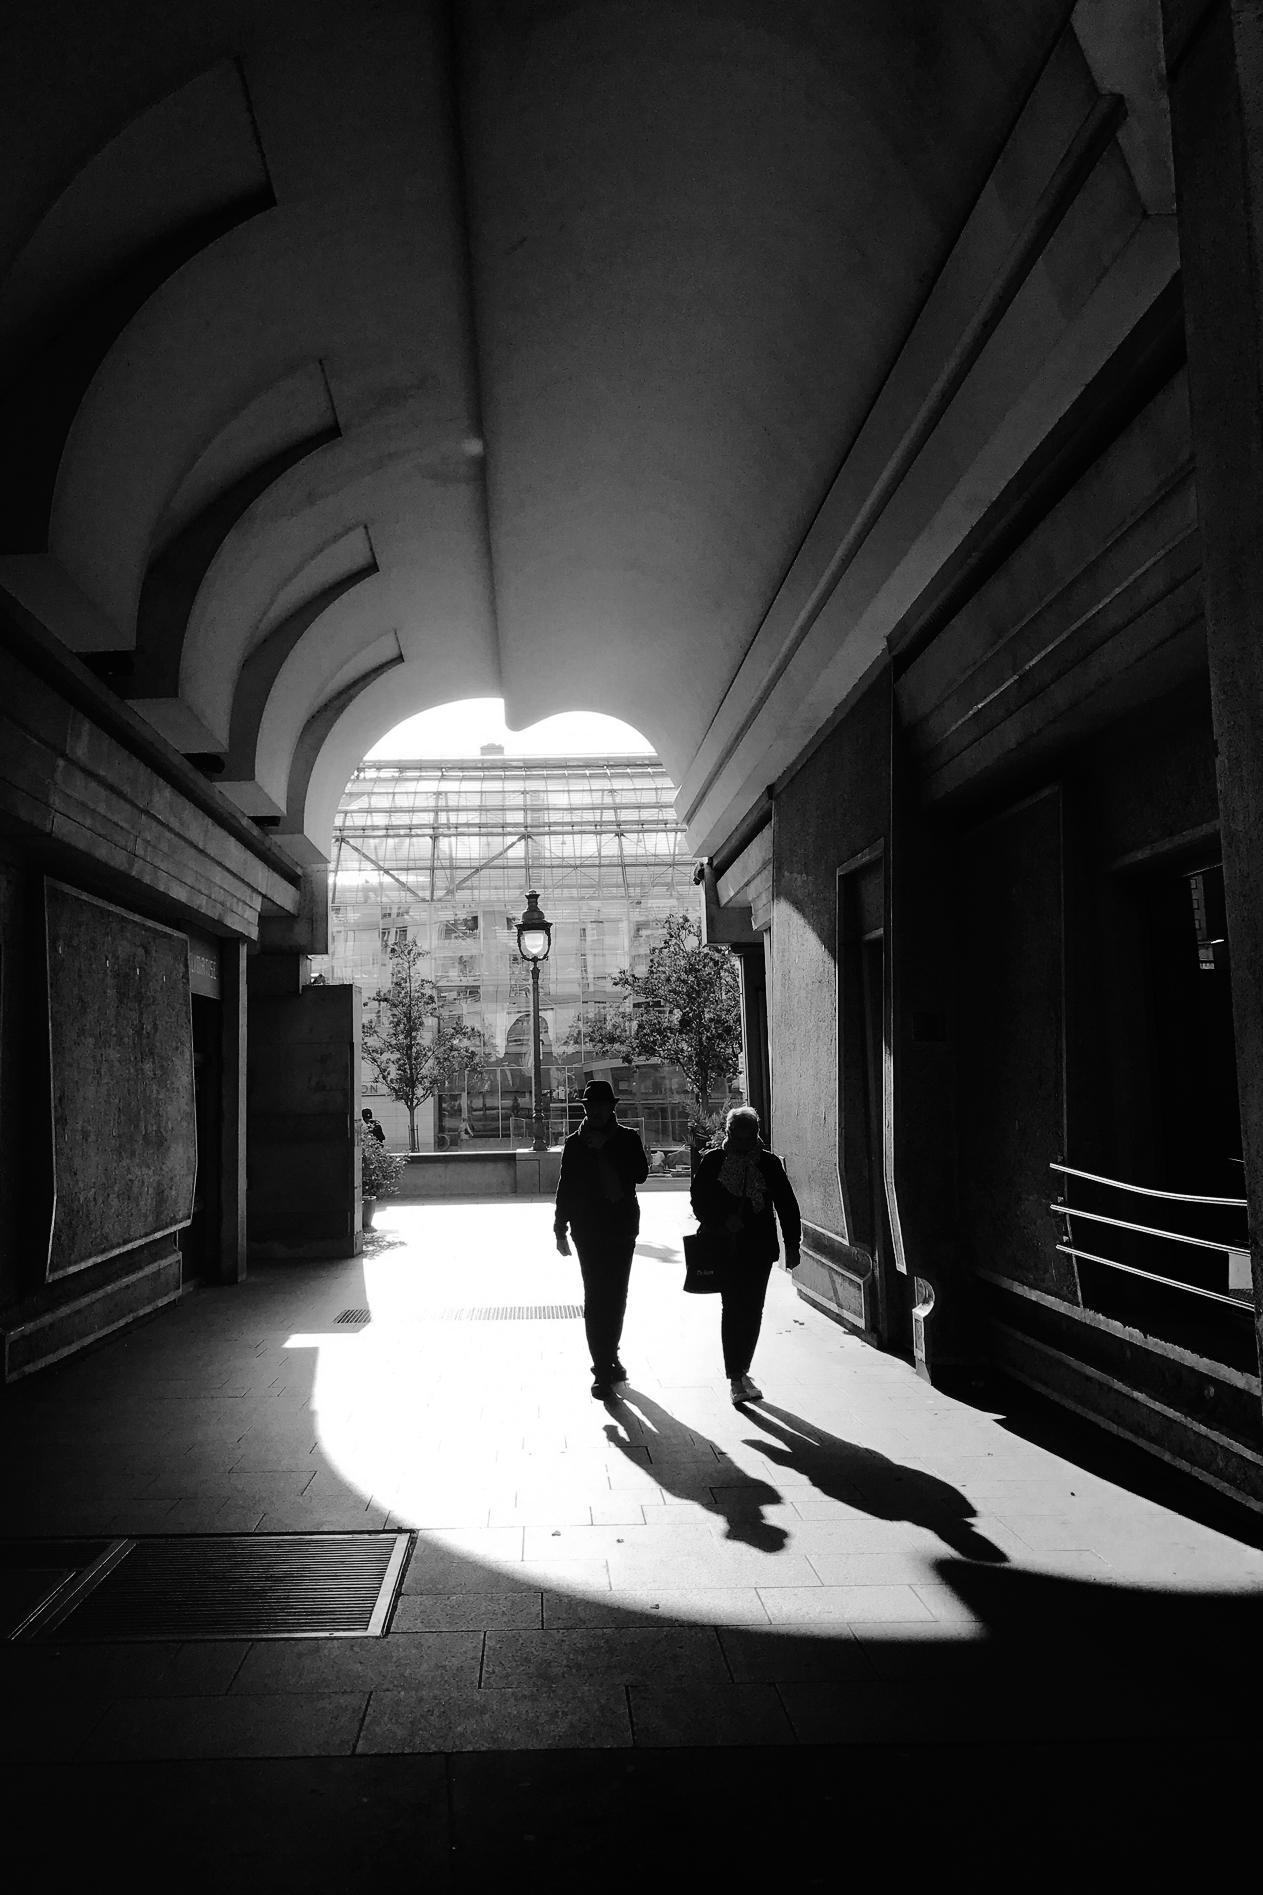 Gare de Lyon  PHOTOGRAPHY: ALEXANDER J.E. BRADLEY • iPhone 7 3.9mm f/1.8